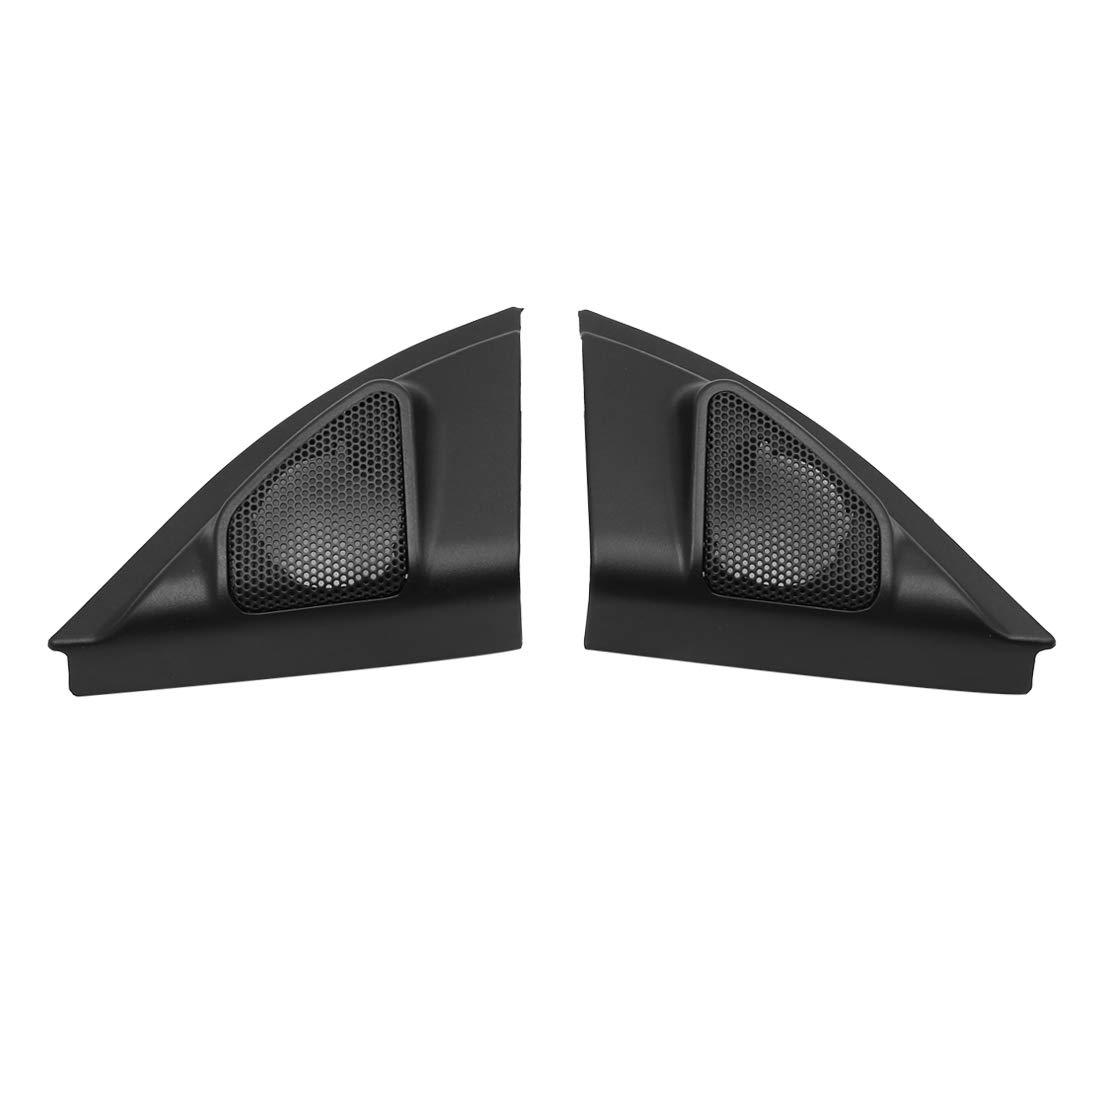 uxcell Pair Black Car Speaker Trim Cover Tweeter Protector for 13-14 Toyota Vios Yaris